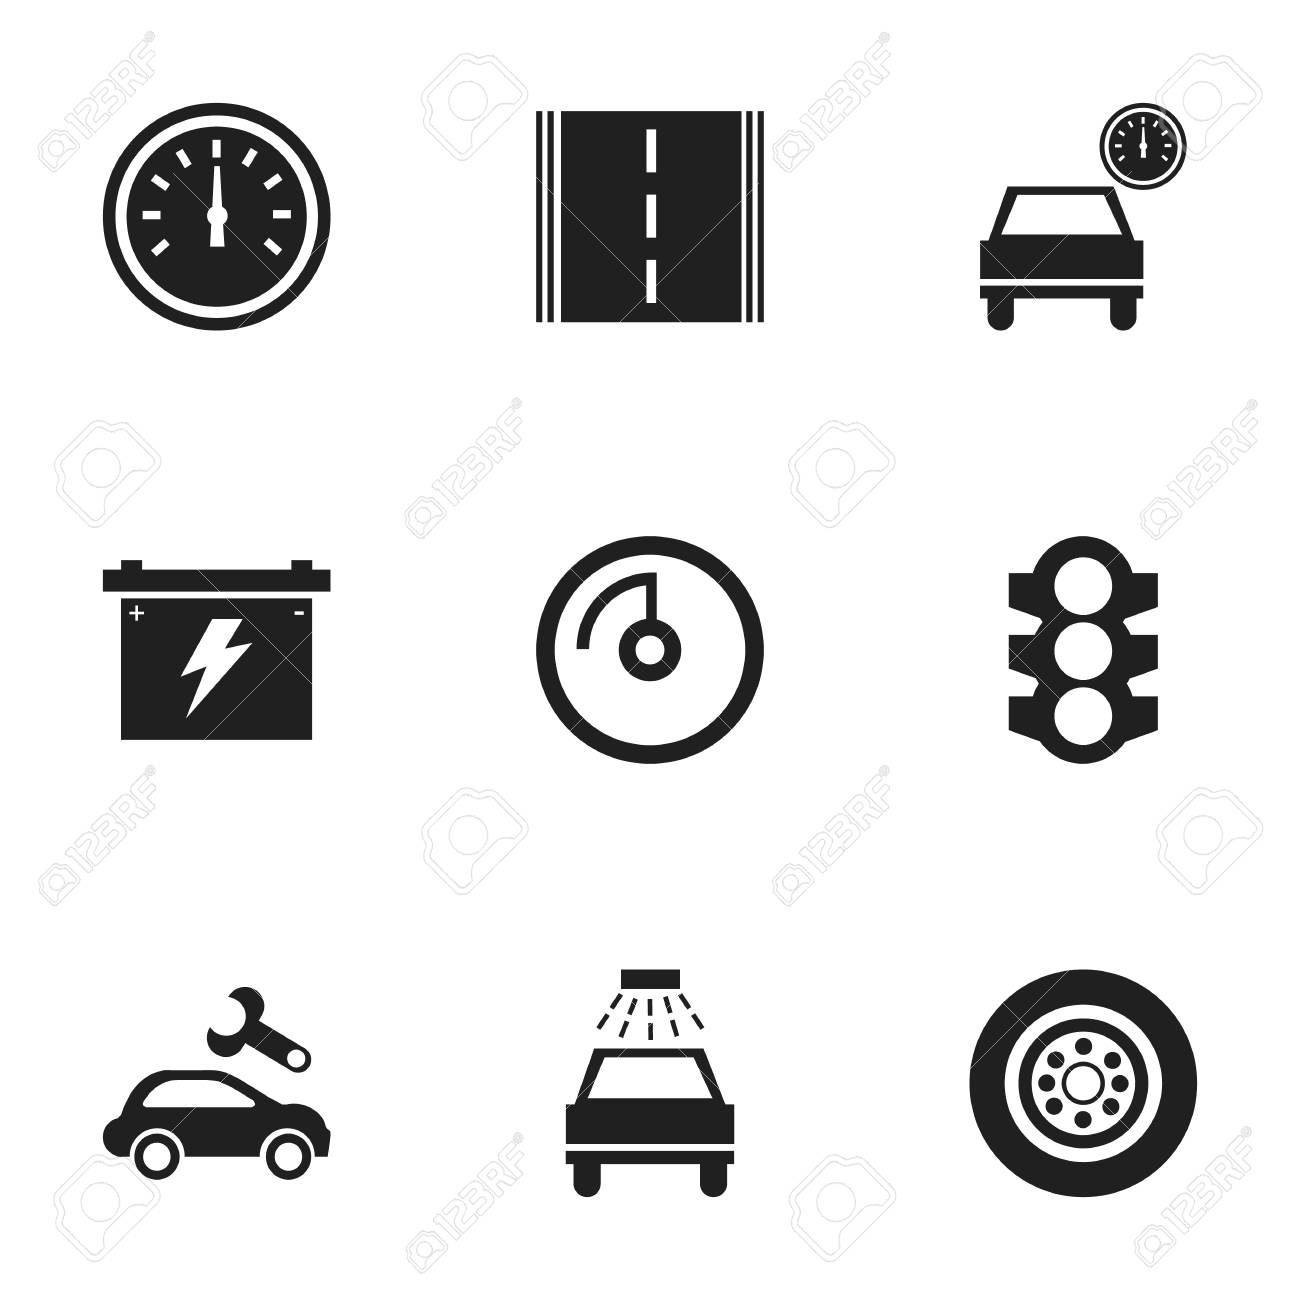 Wunderbar Automobile Elektronische Symbole Ideen - Elektrische ...